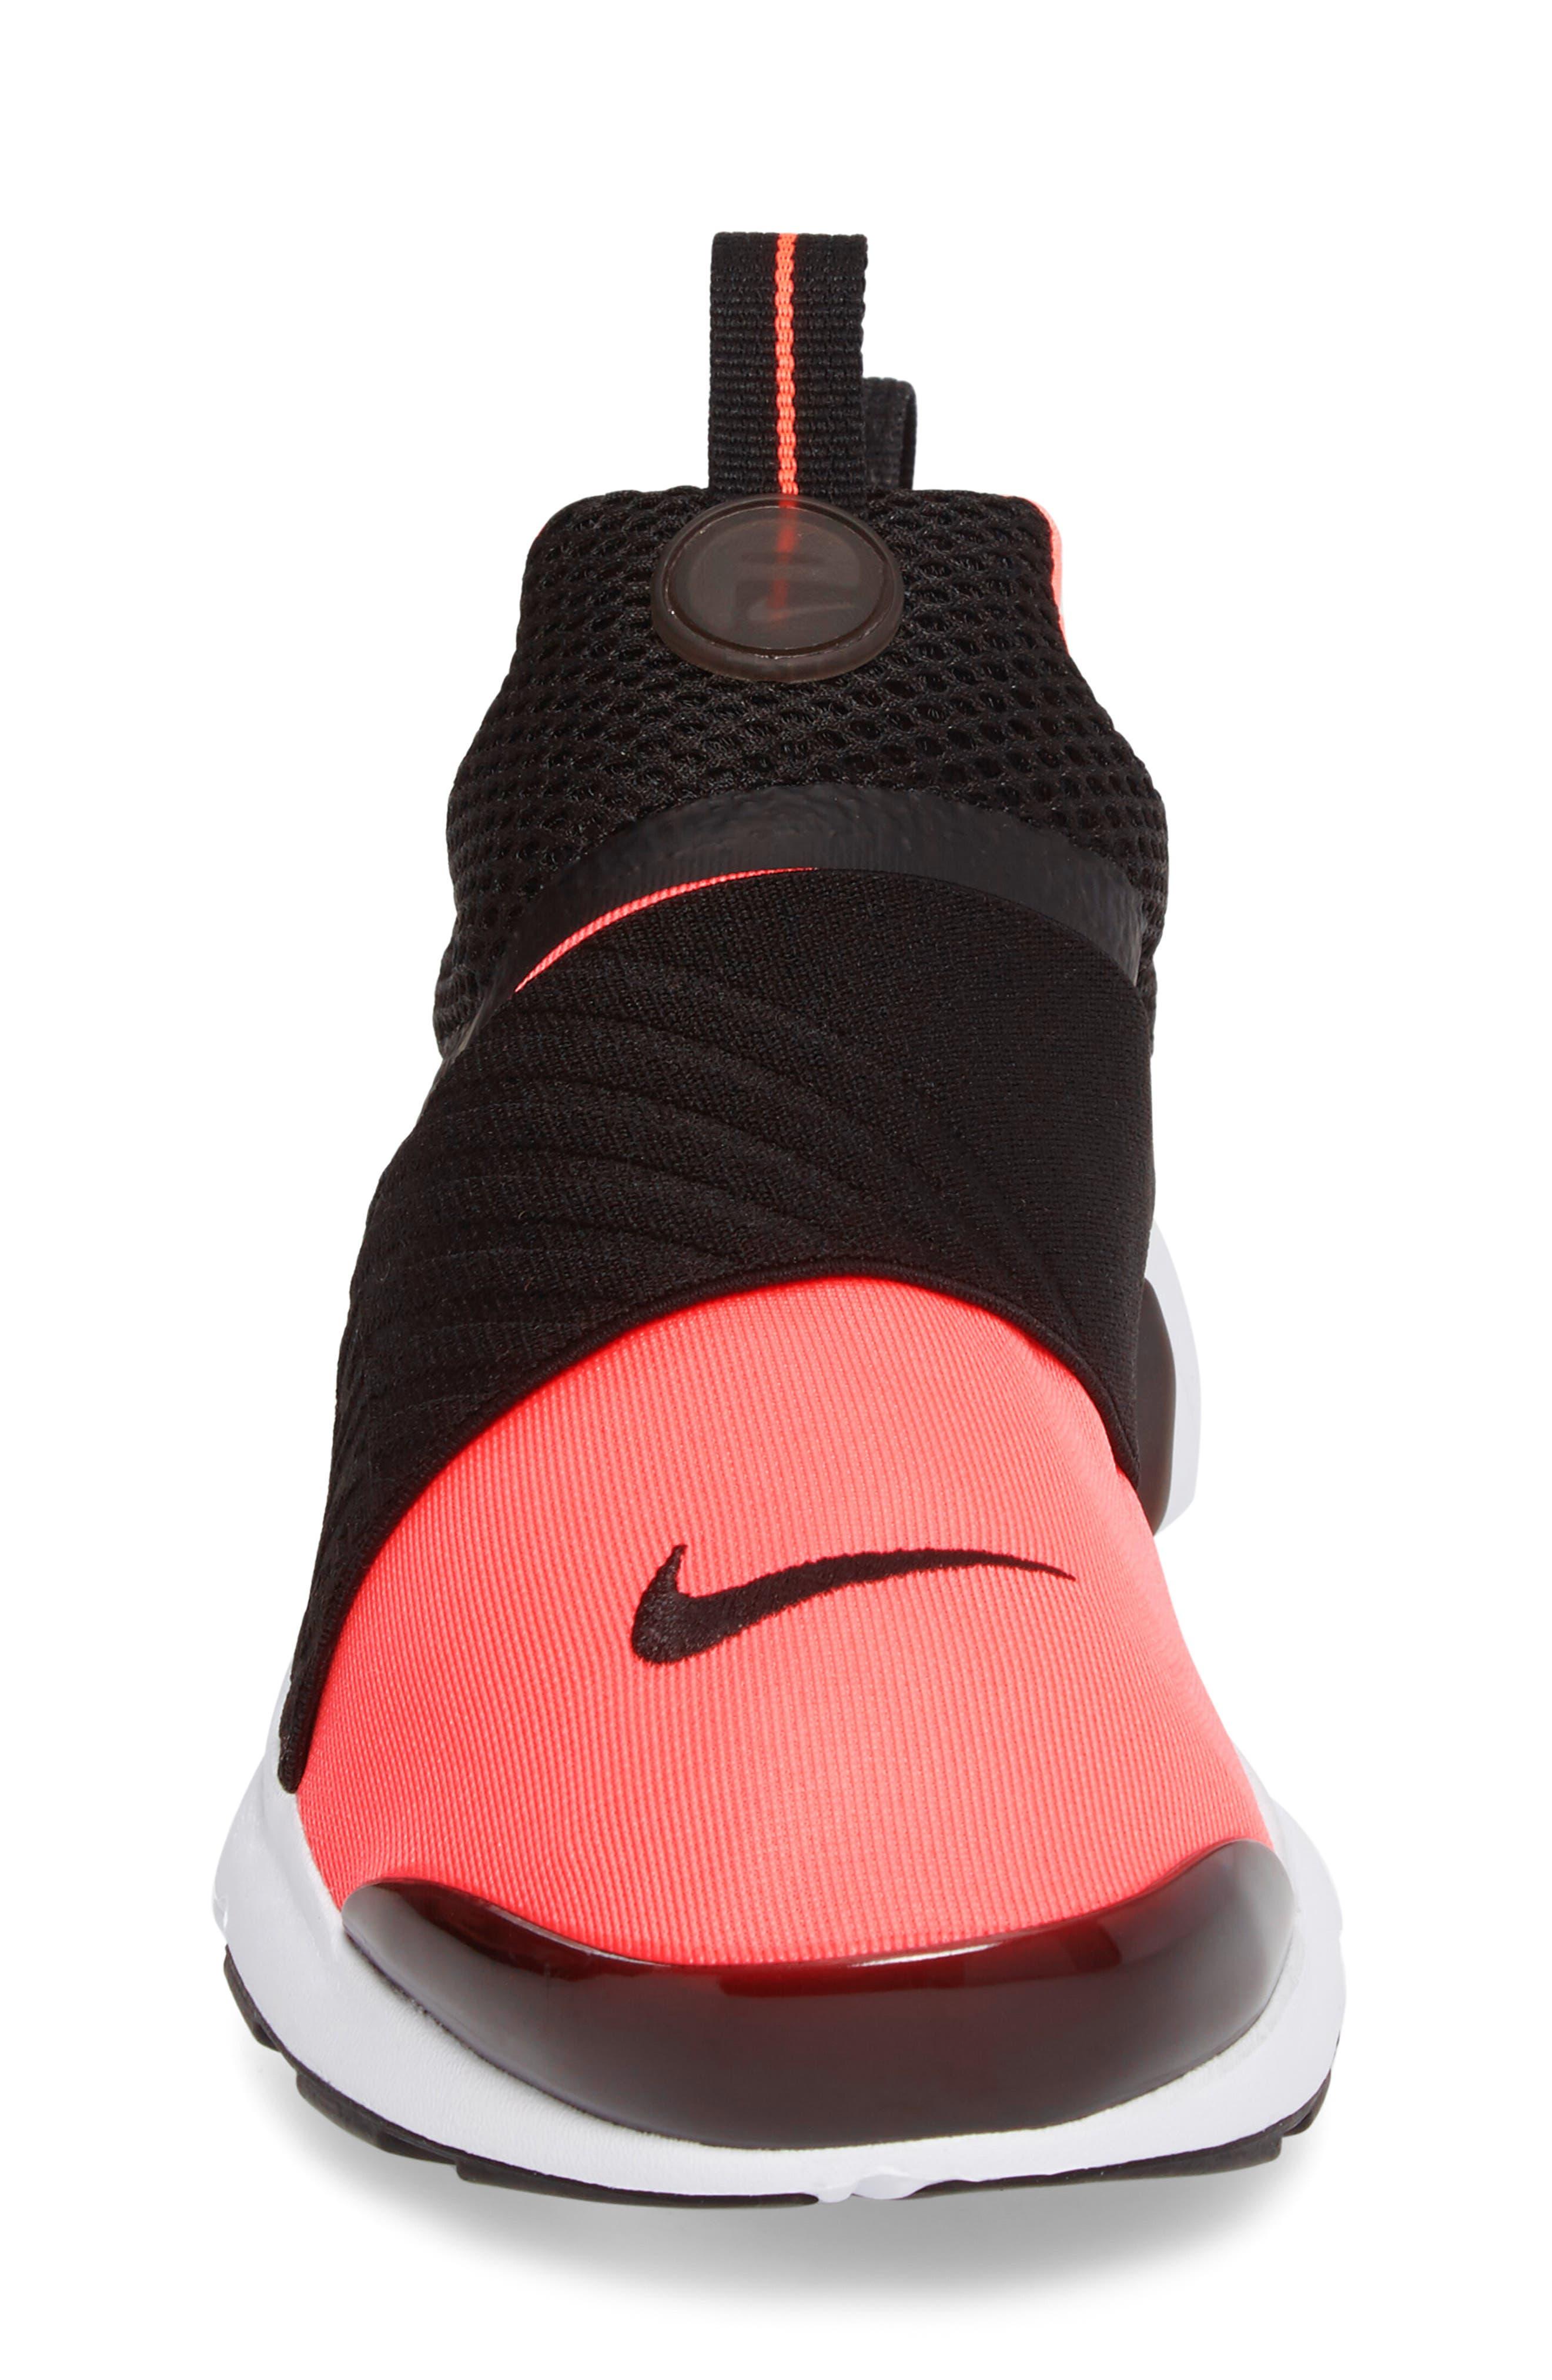 Presto Extreme Sneaker,                             Alternate thumbnail 15, color,